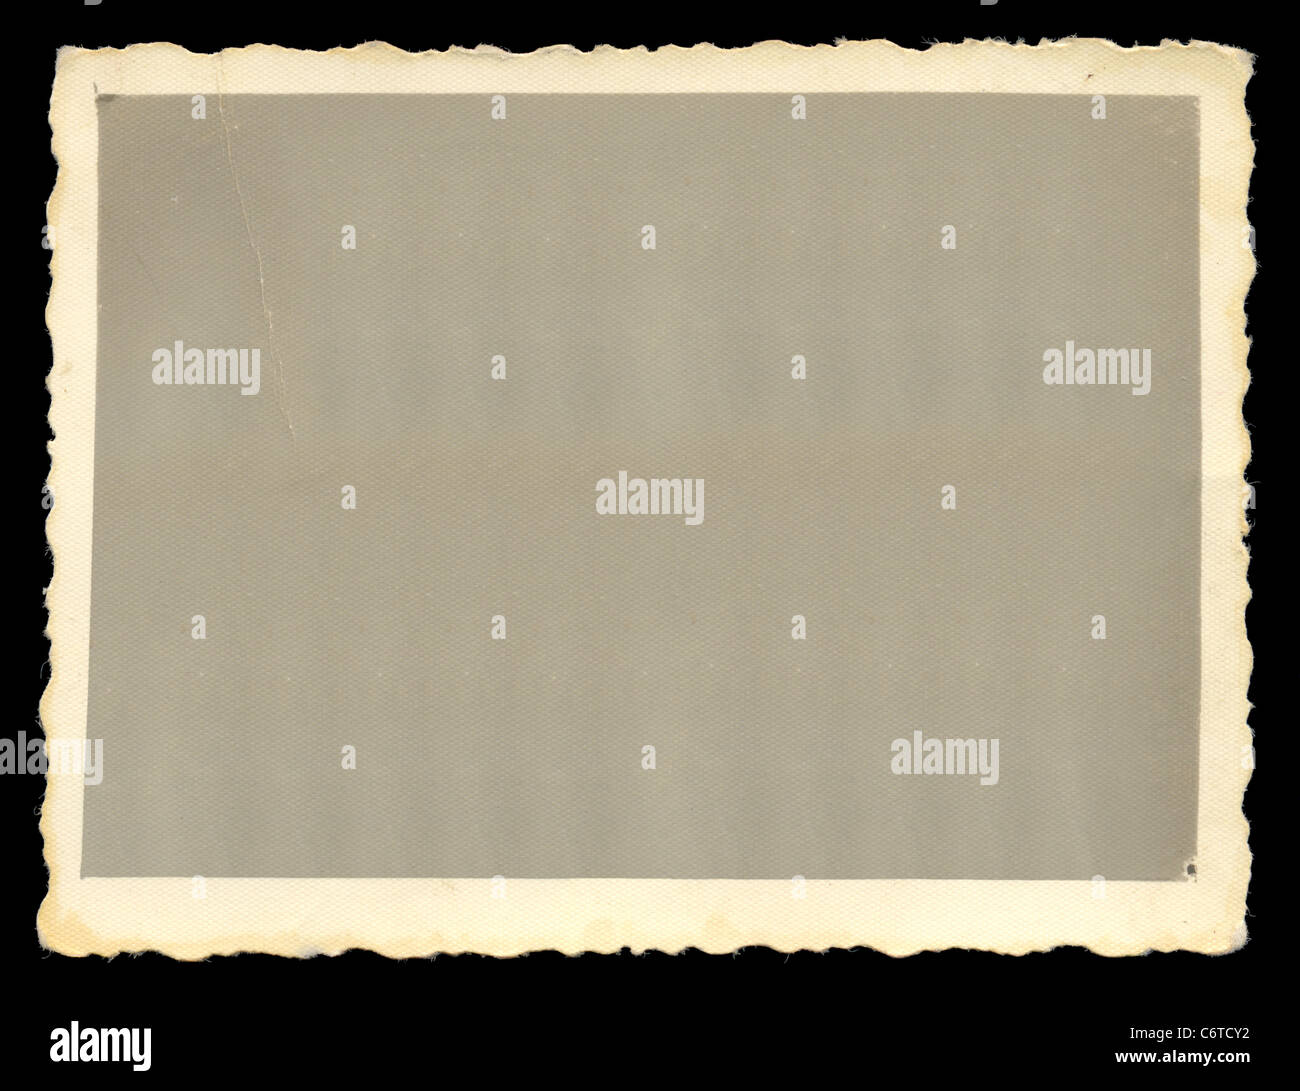 vintage alte leere foto design element mit wei em rand stockfoto bild 38645686 alamy. Black Bedroom Furniture Sets. Home Design Ideas